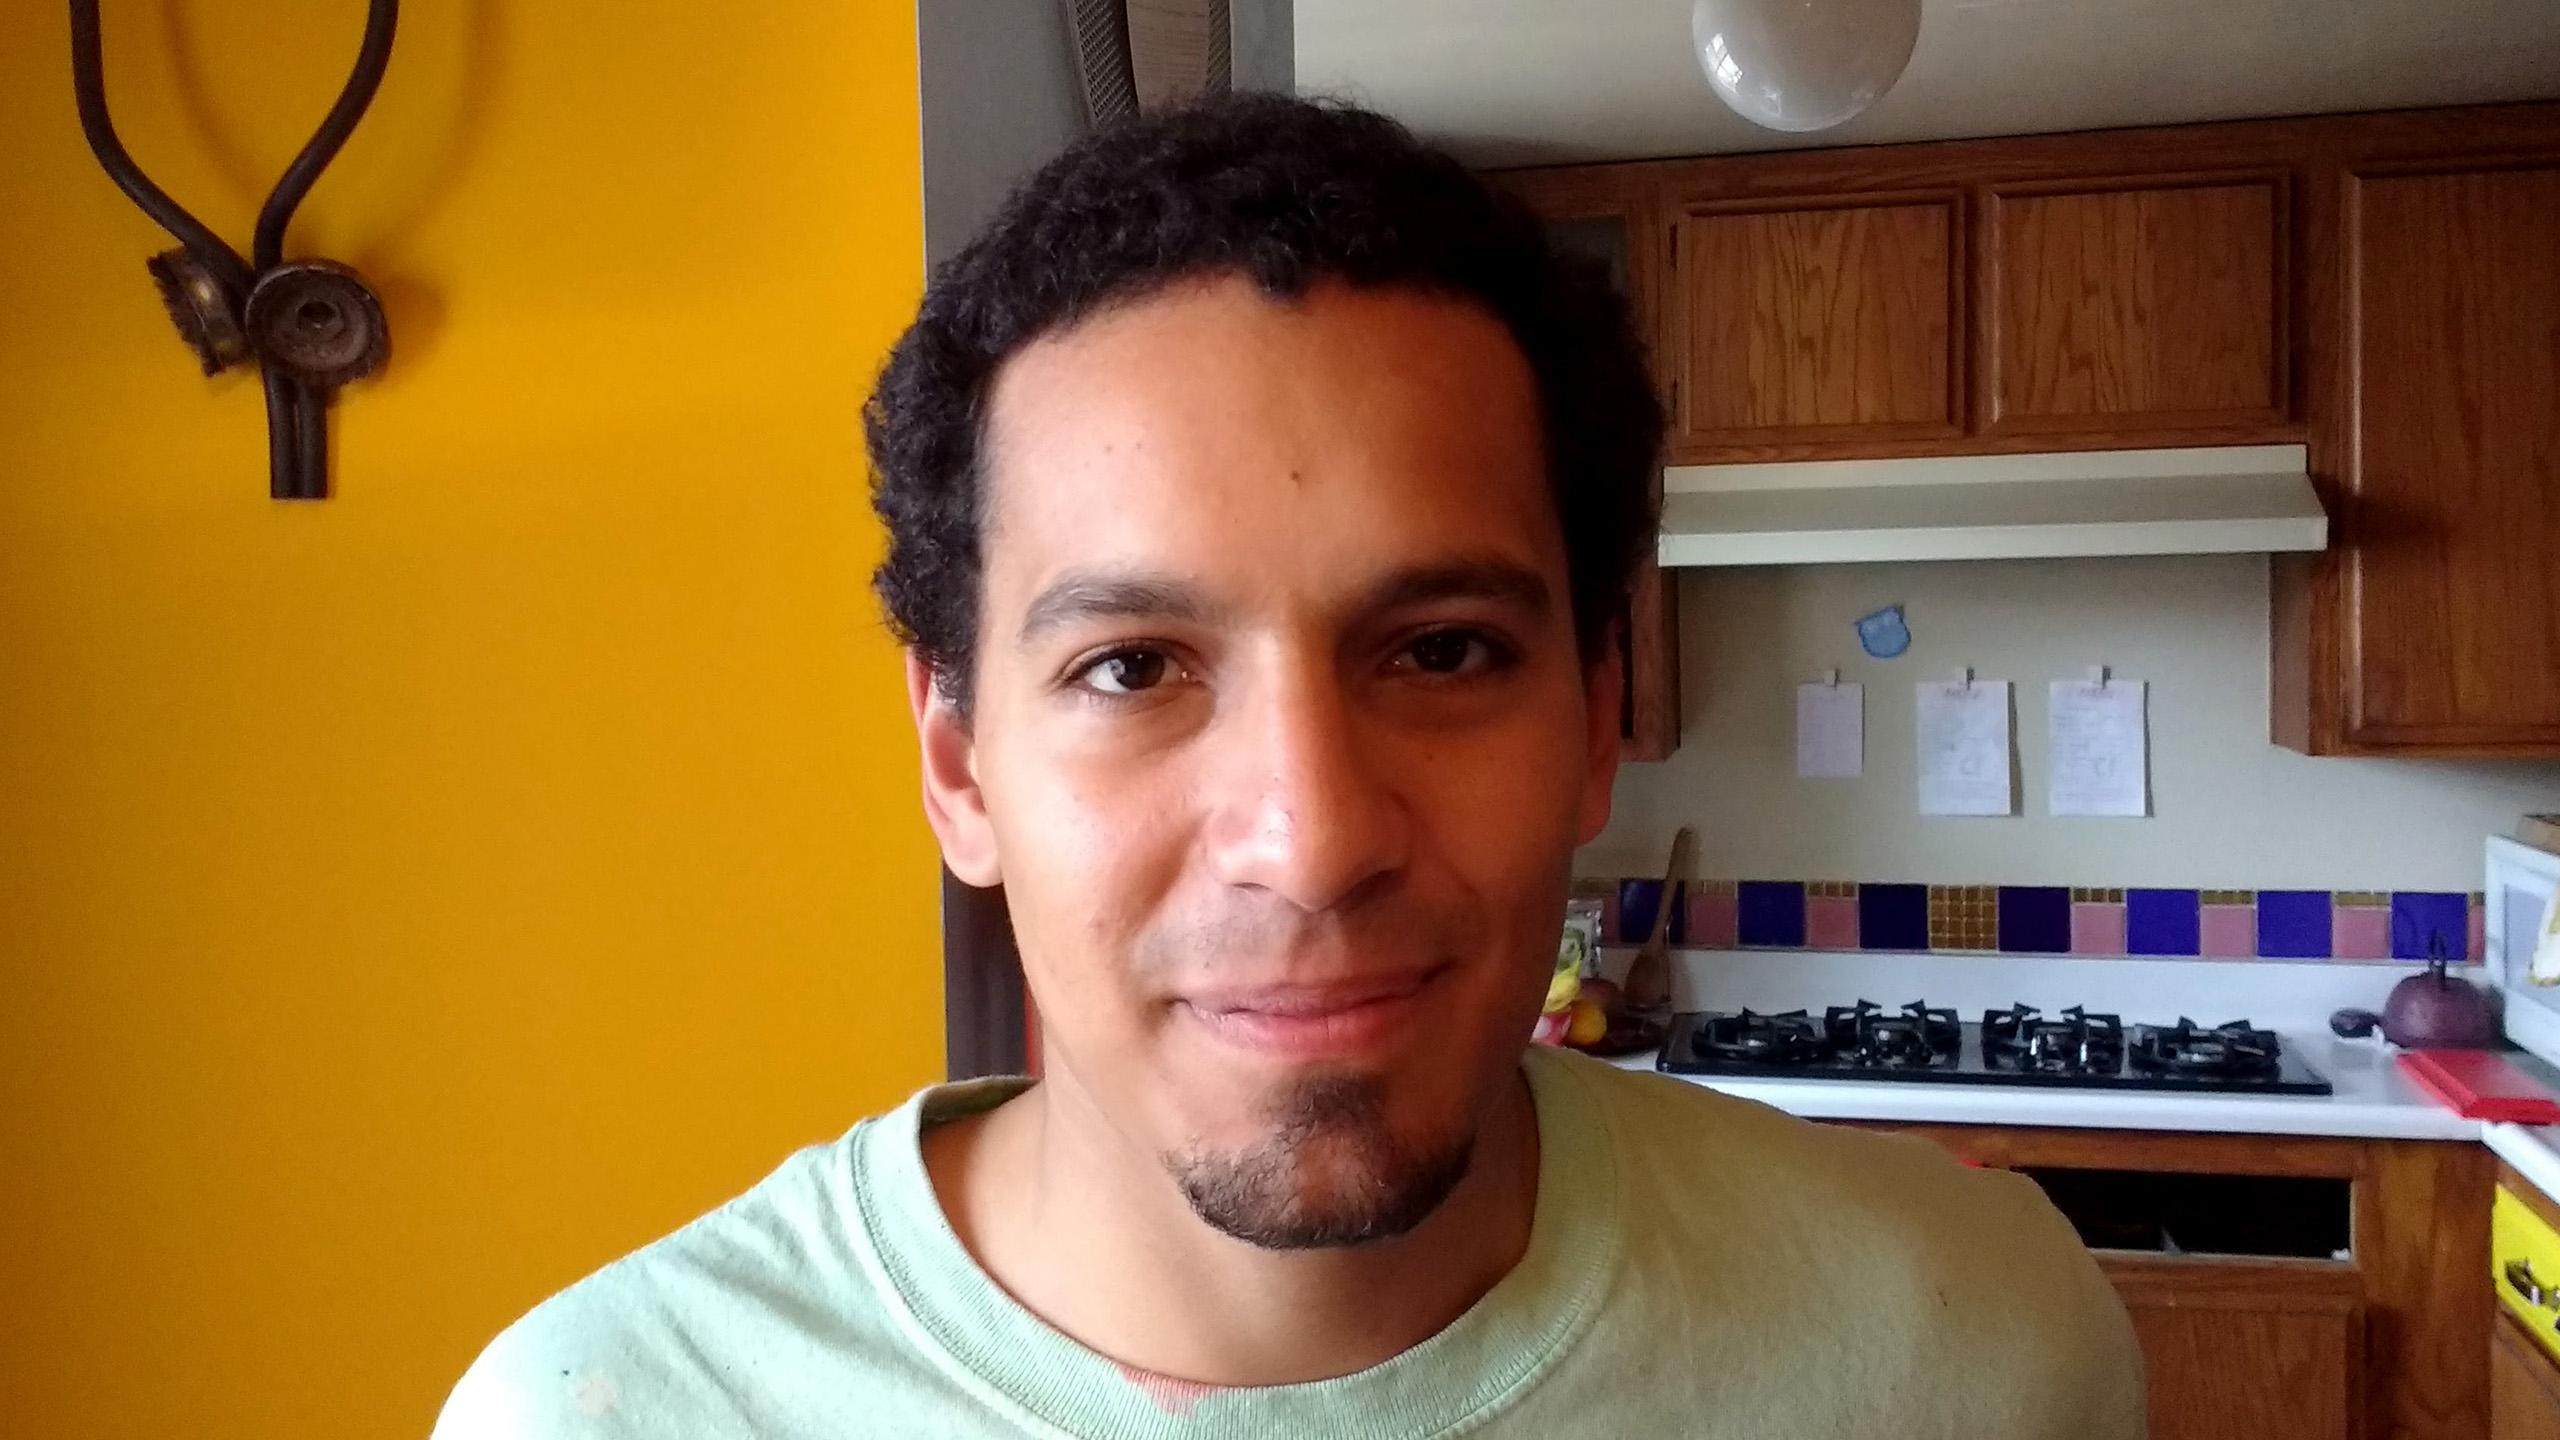 Samuel with dark, curly hair